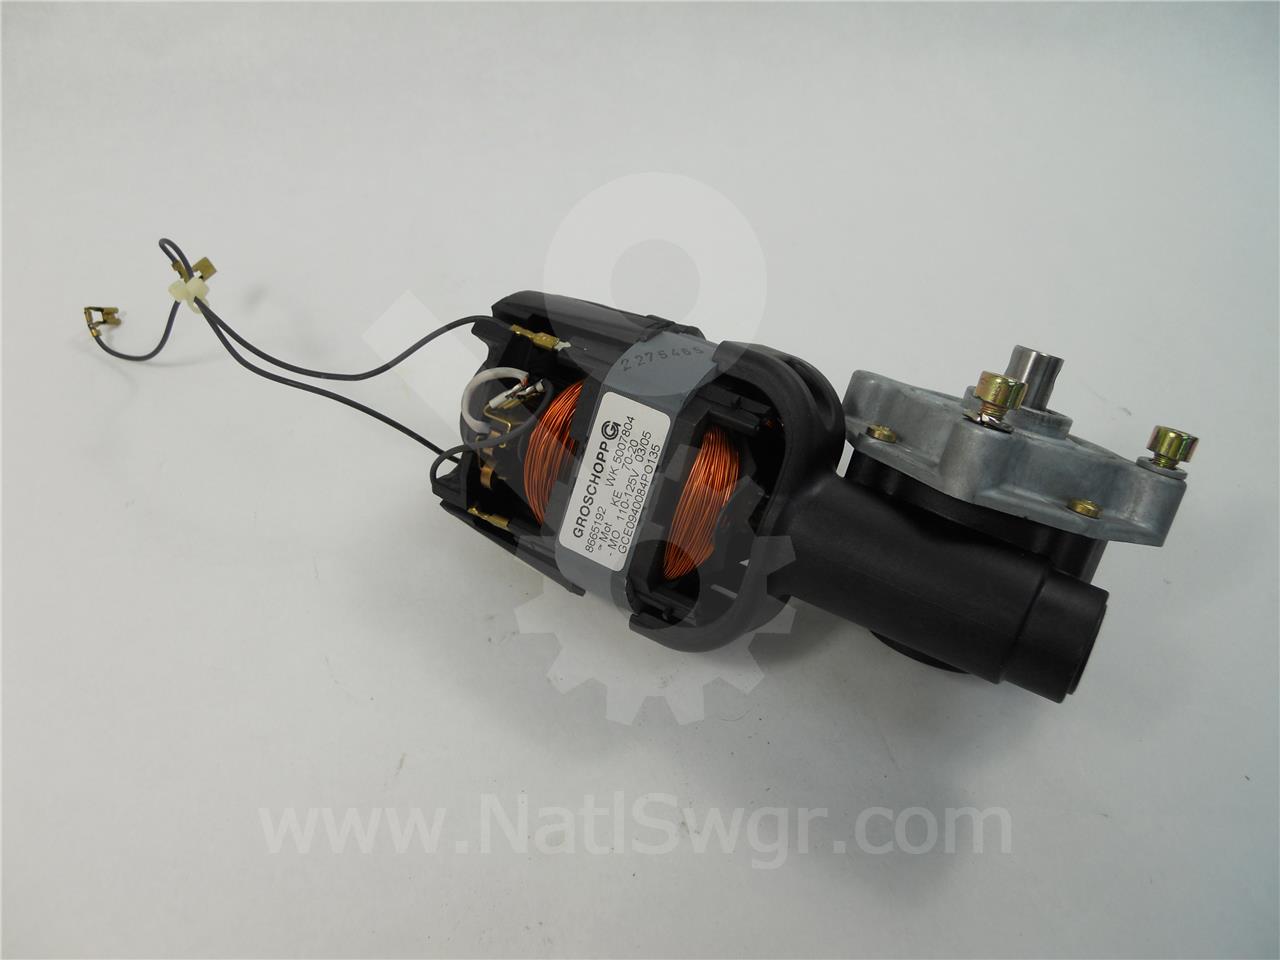 Abb Ite Bbc 120vac Dc Charge Motor Wiring Diagram